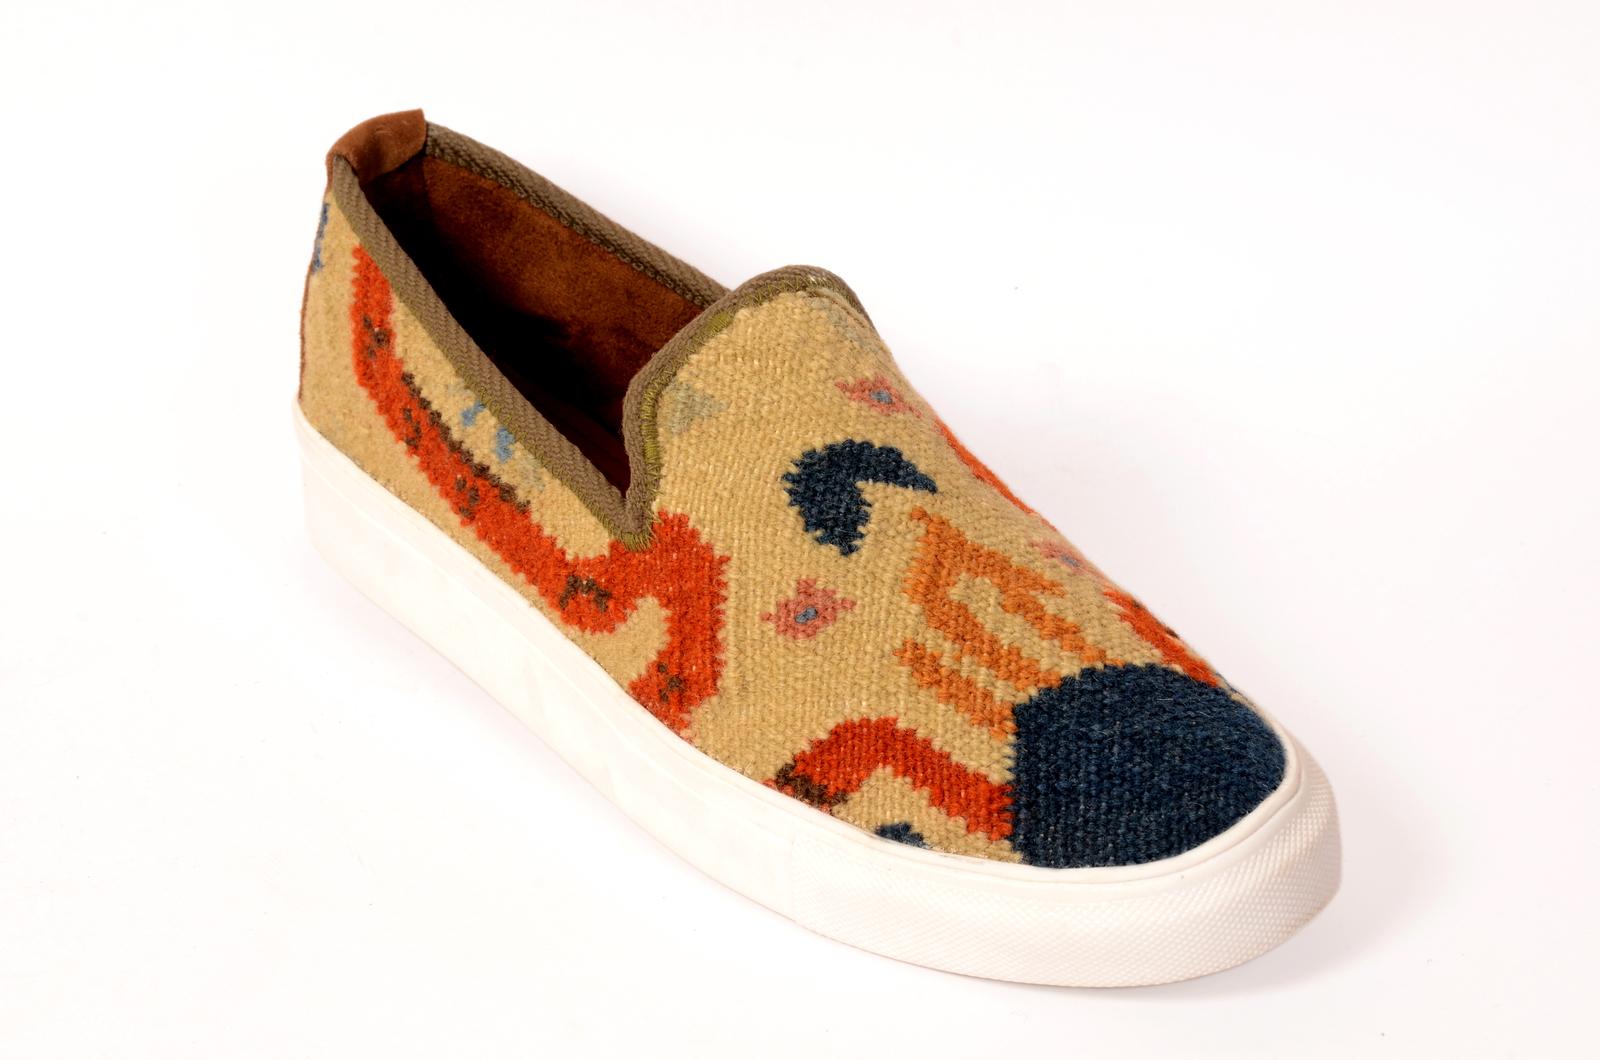 8d5eccfd2ed Handmade Kilim Shoes